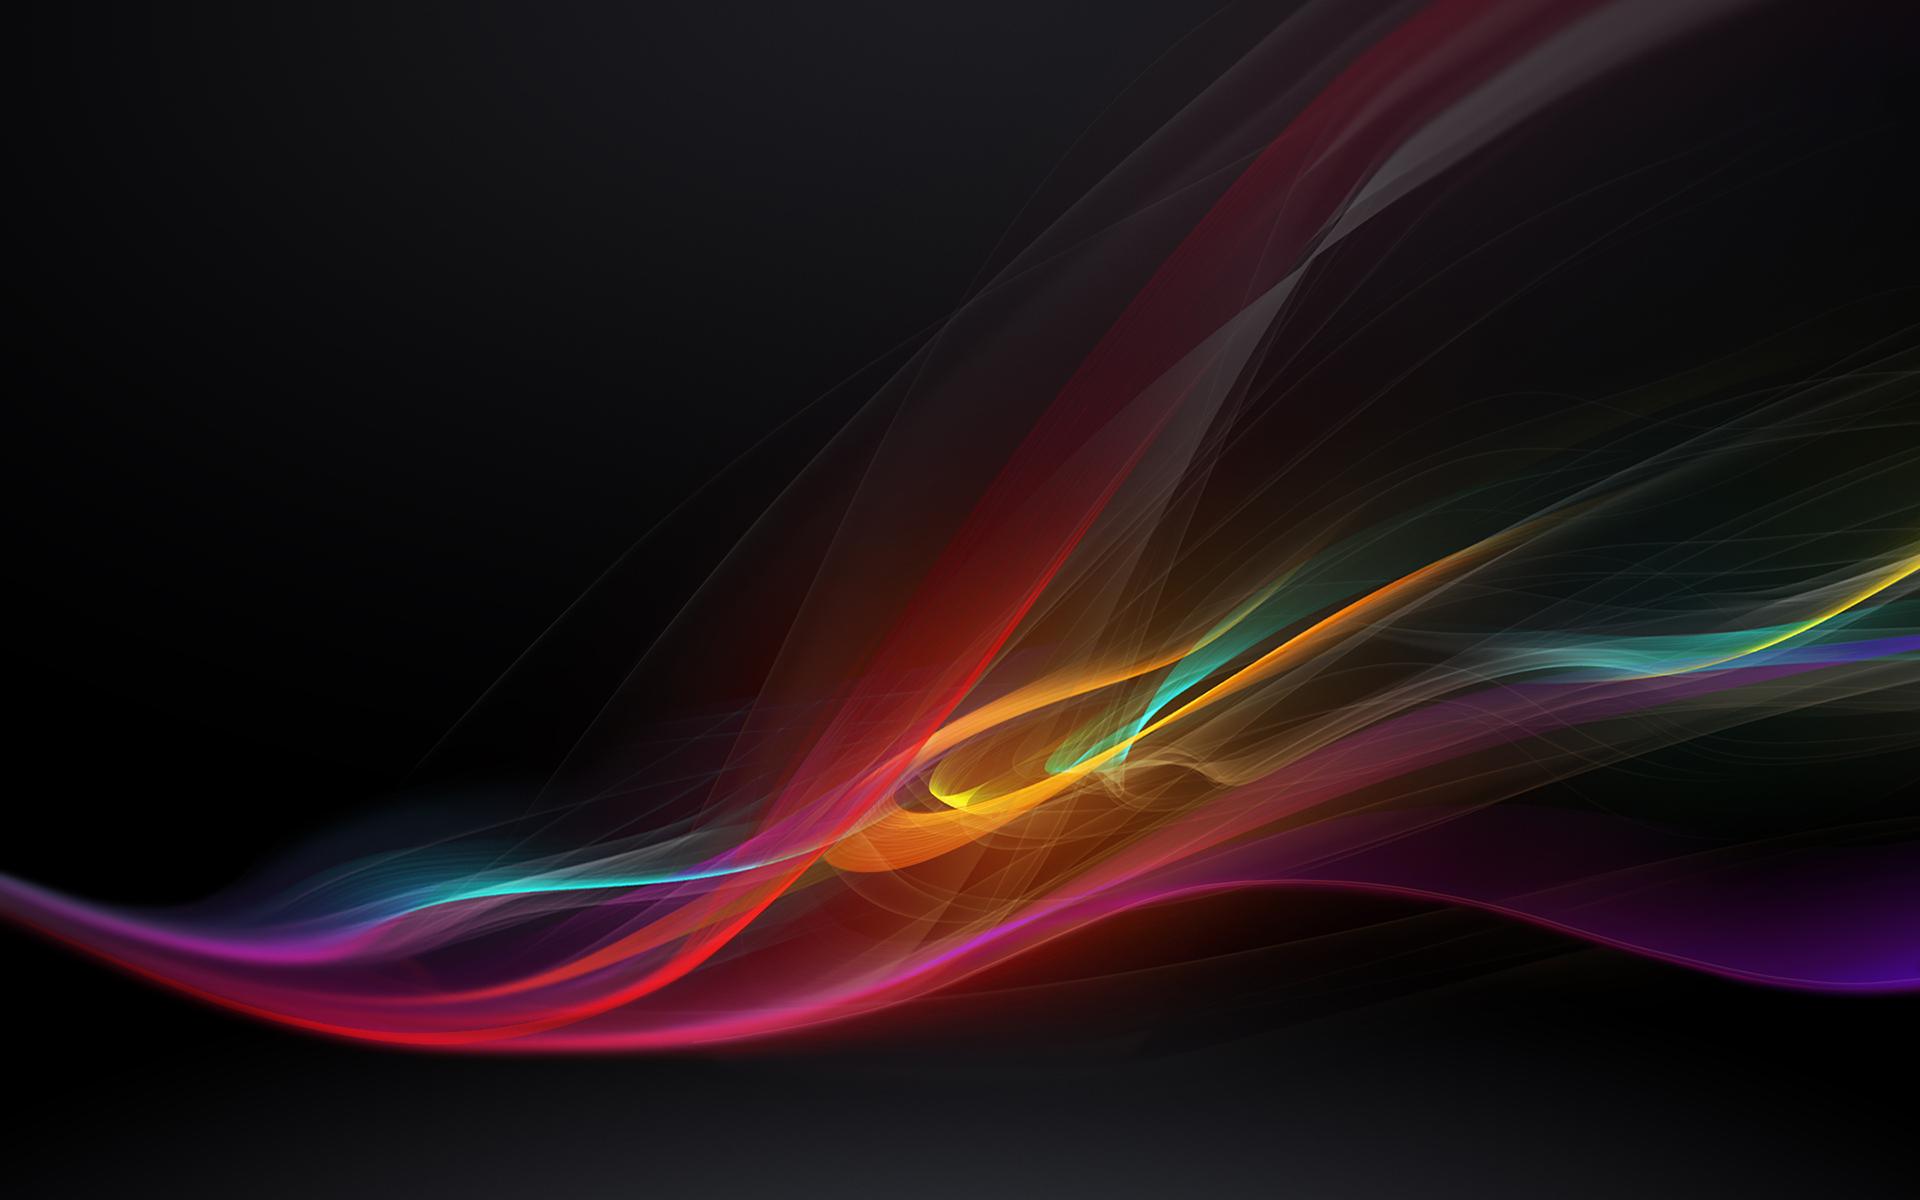 Sony Xperia Z Wallpaper HD   Wallpup.com